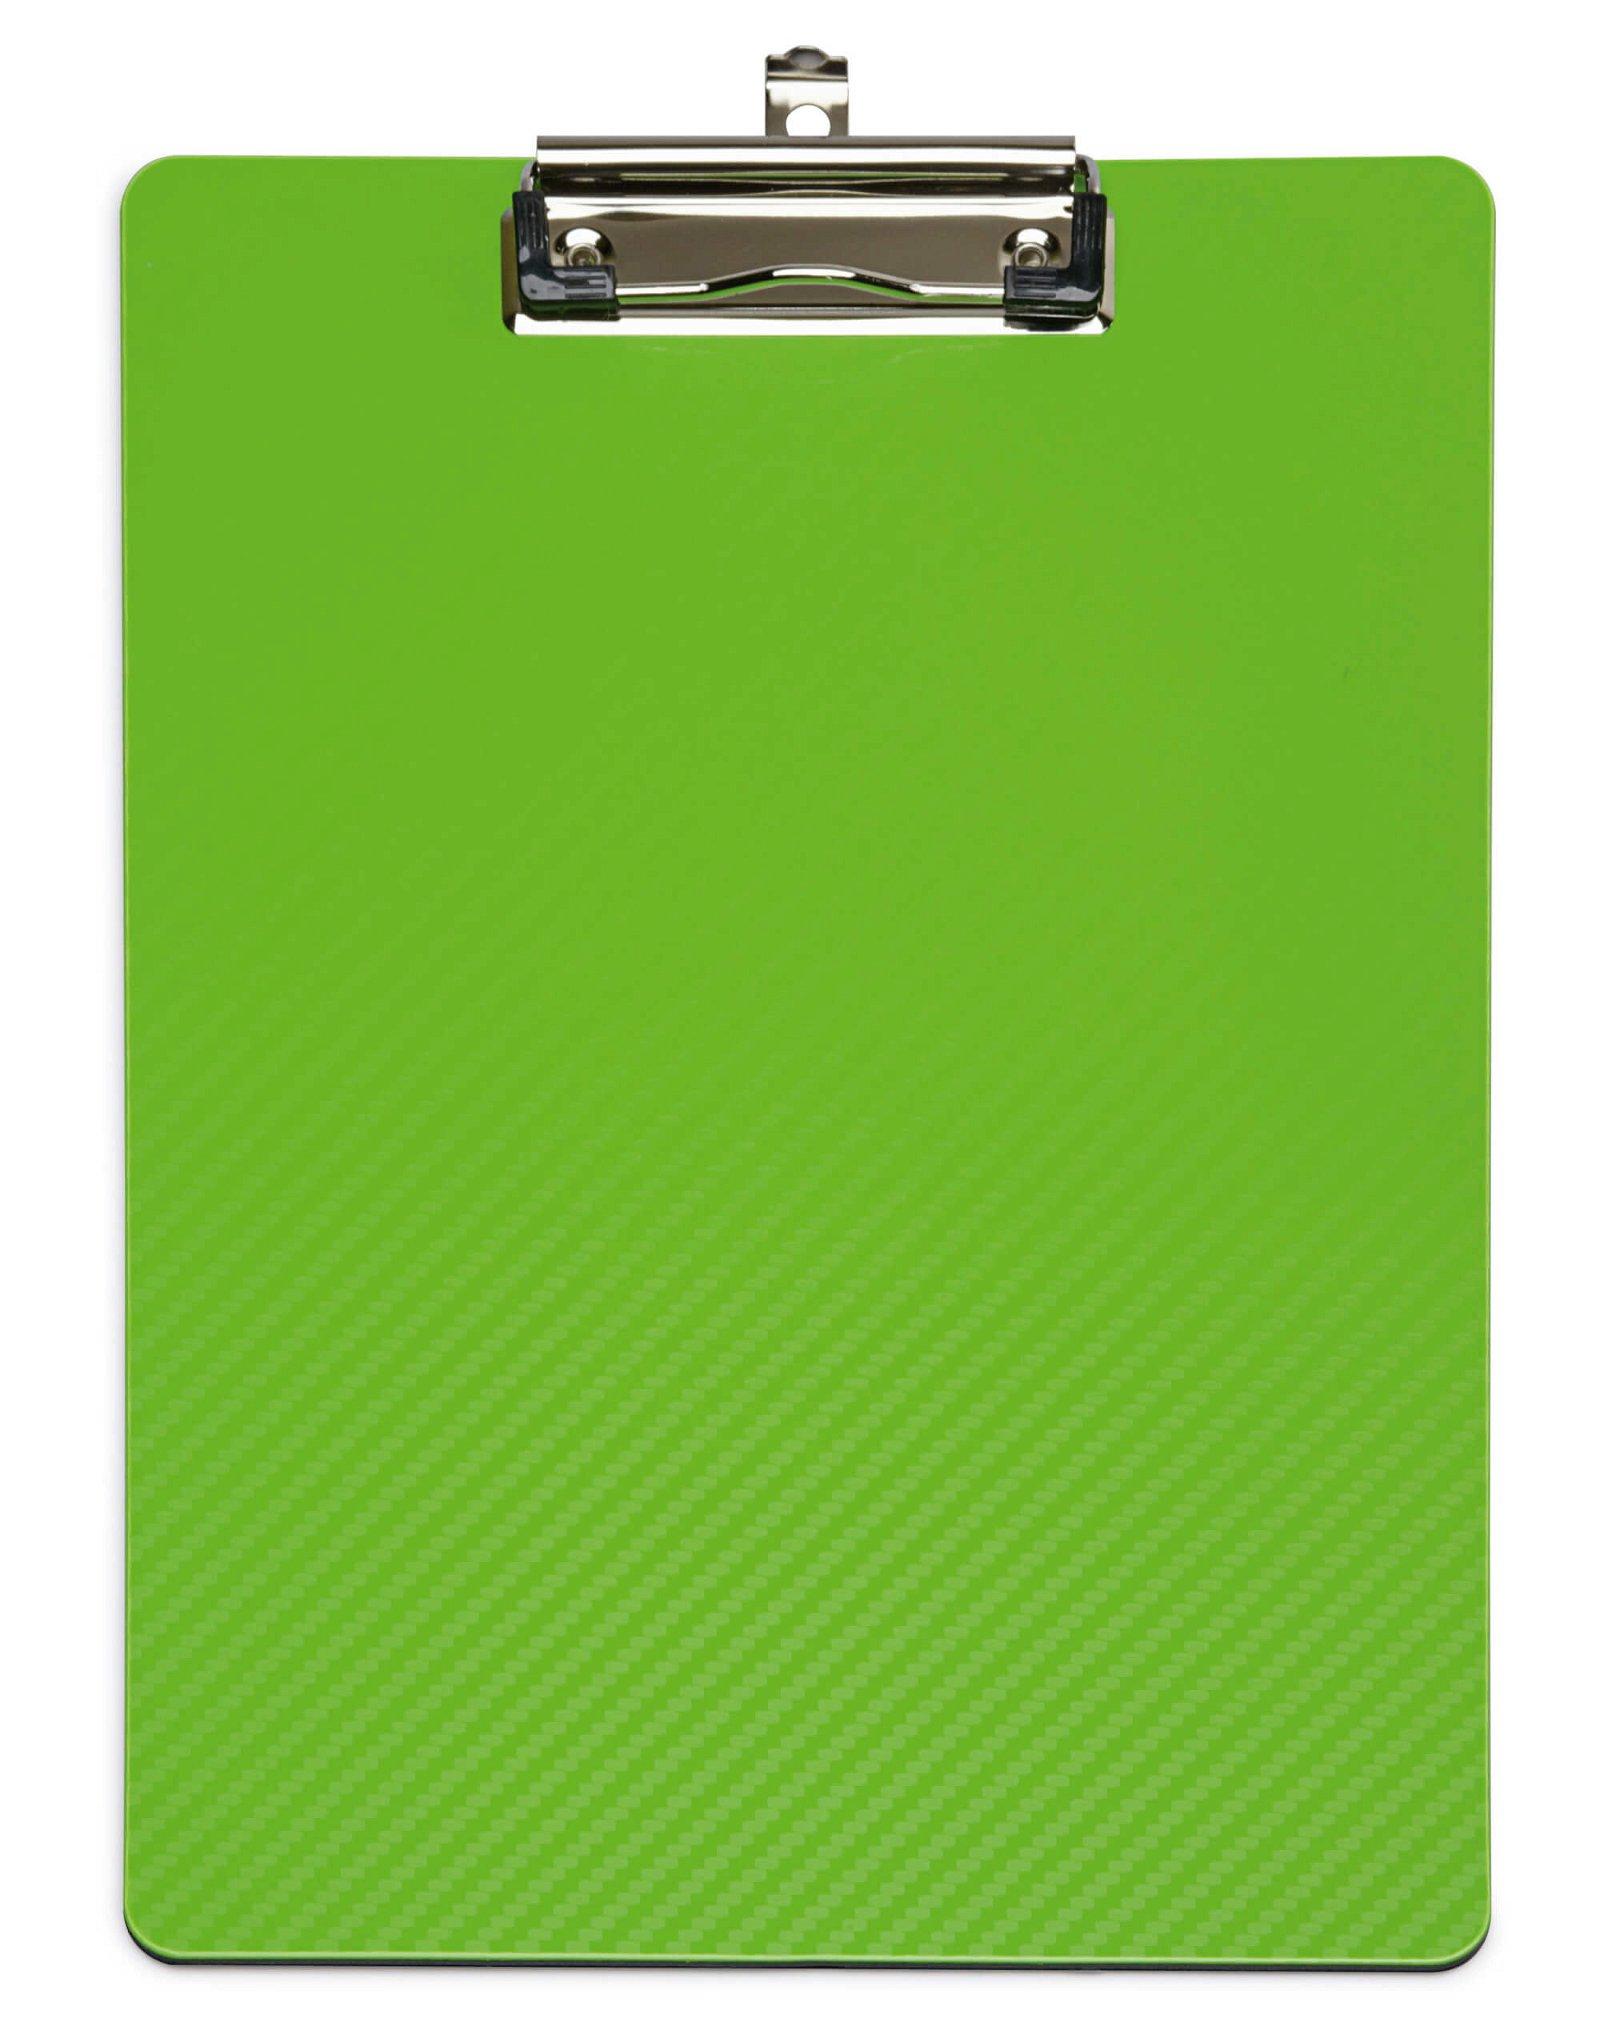 A4 Schreibplatte MAULflexx, hellgrün